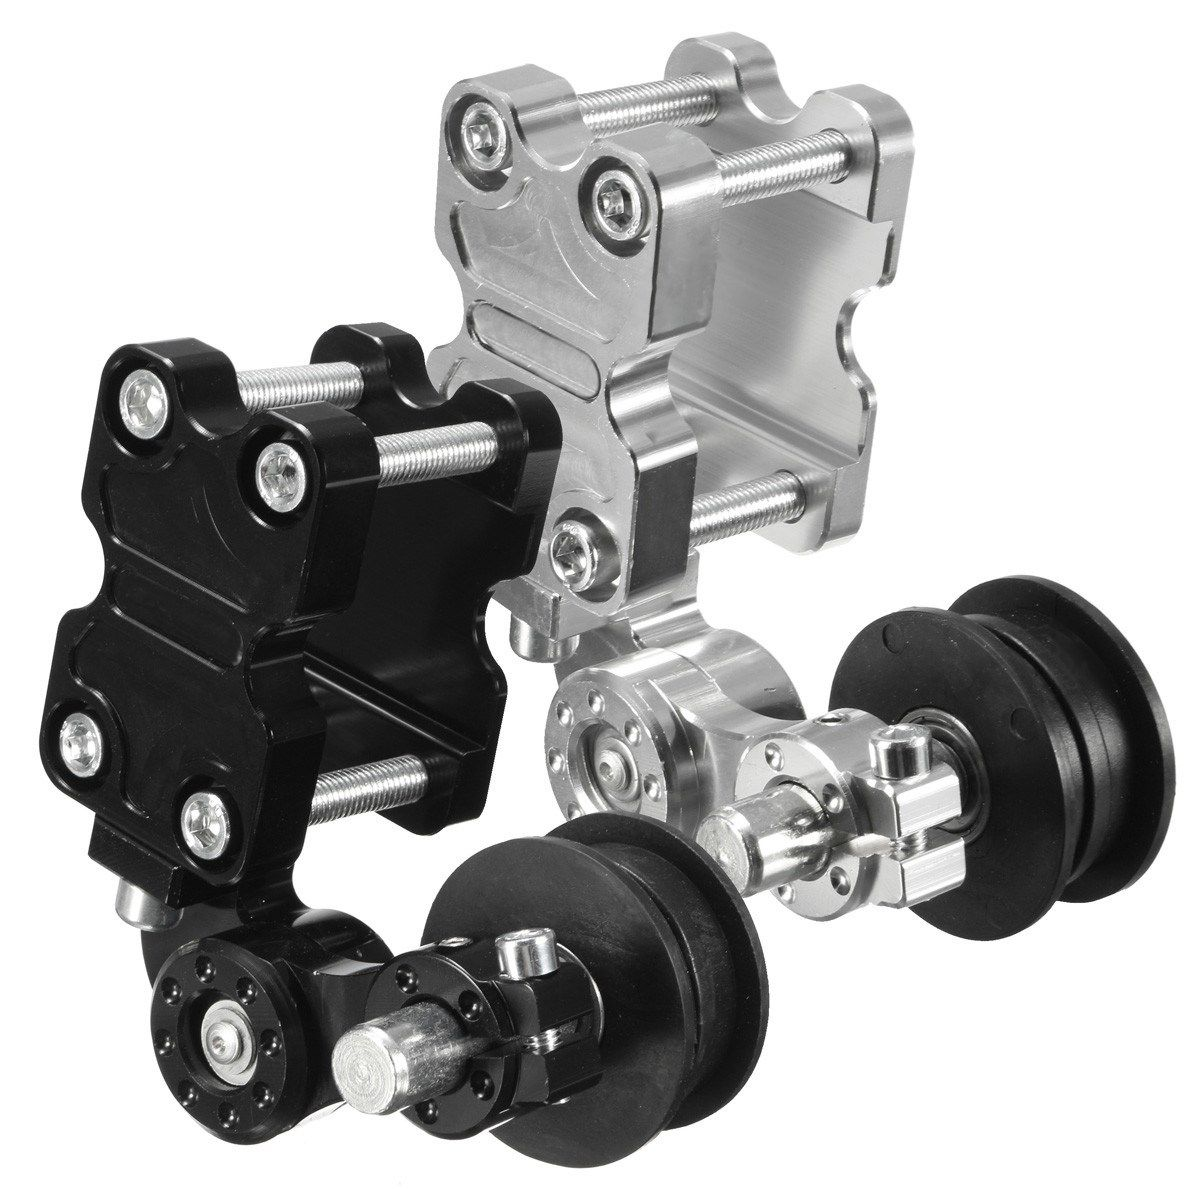 Universal Black Silver Aluminum Adjuster Chain Tensioner Roller For Motorcycle /Chopper ATV